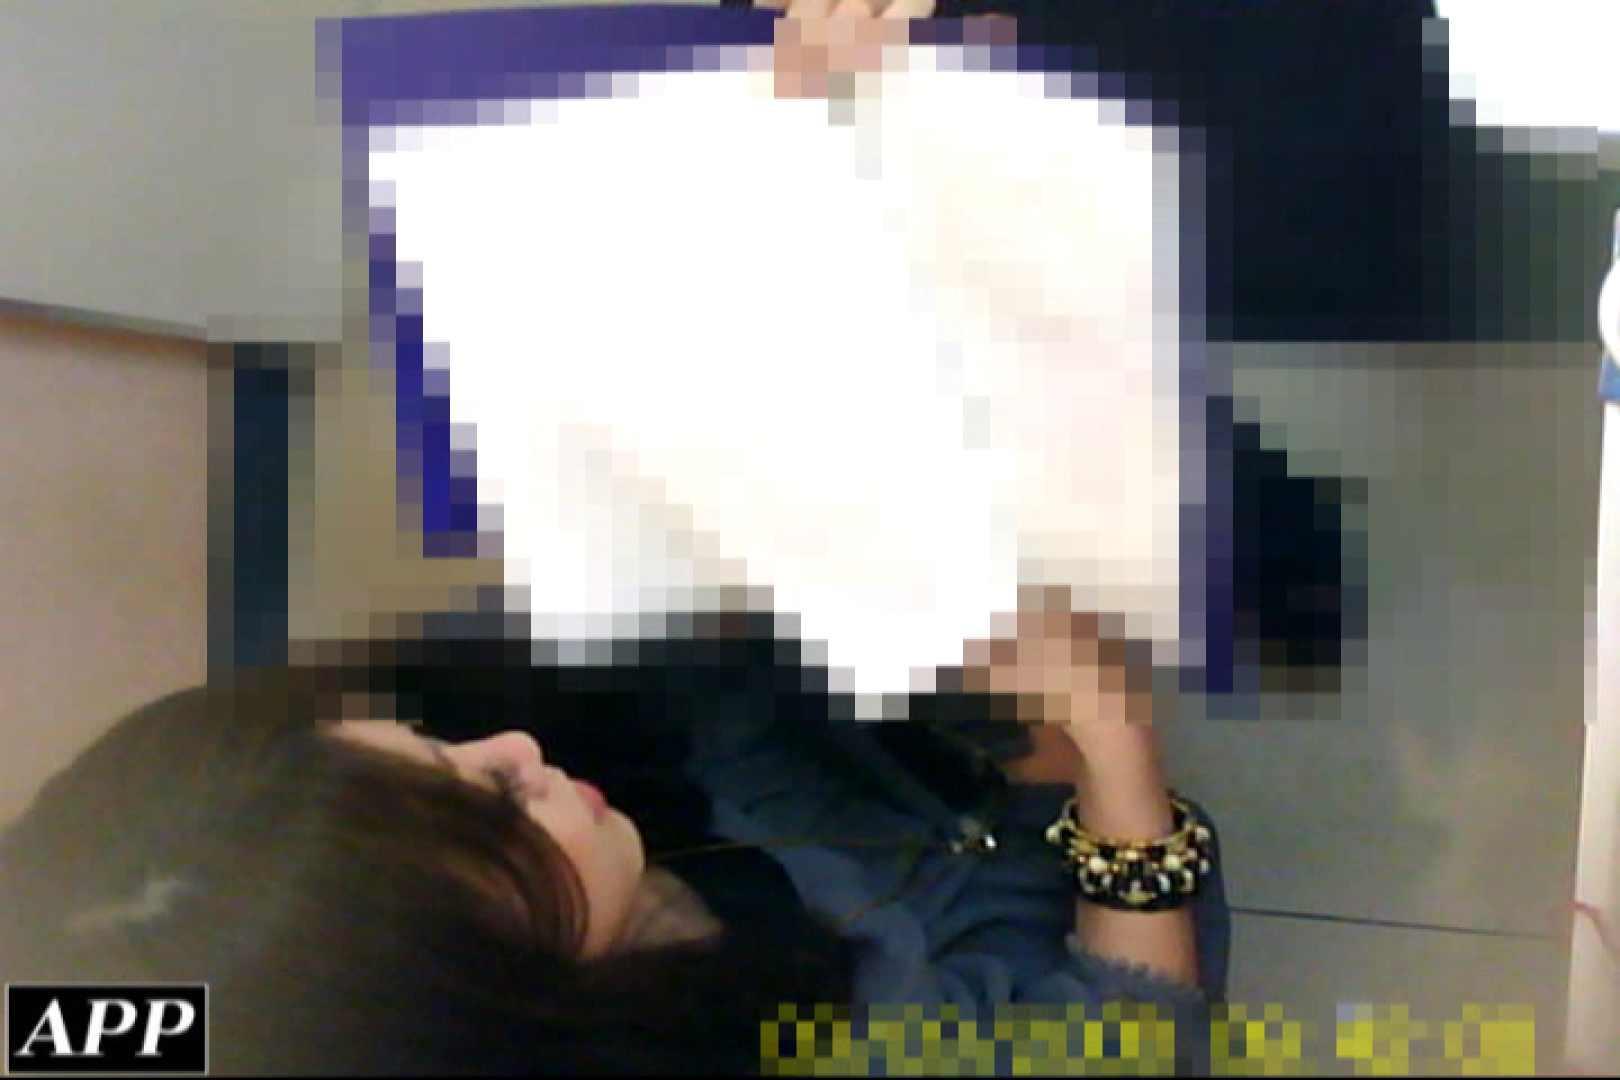 3視点洗面所 vol.139 洗面所編 ぱこり動画紹介 99PIX 58